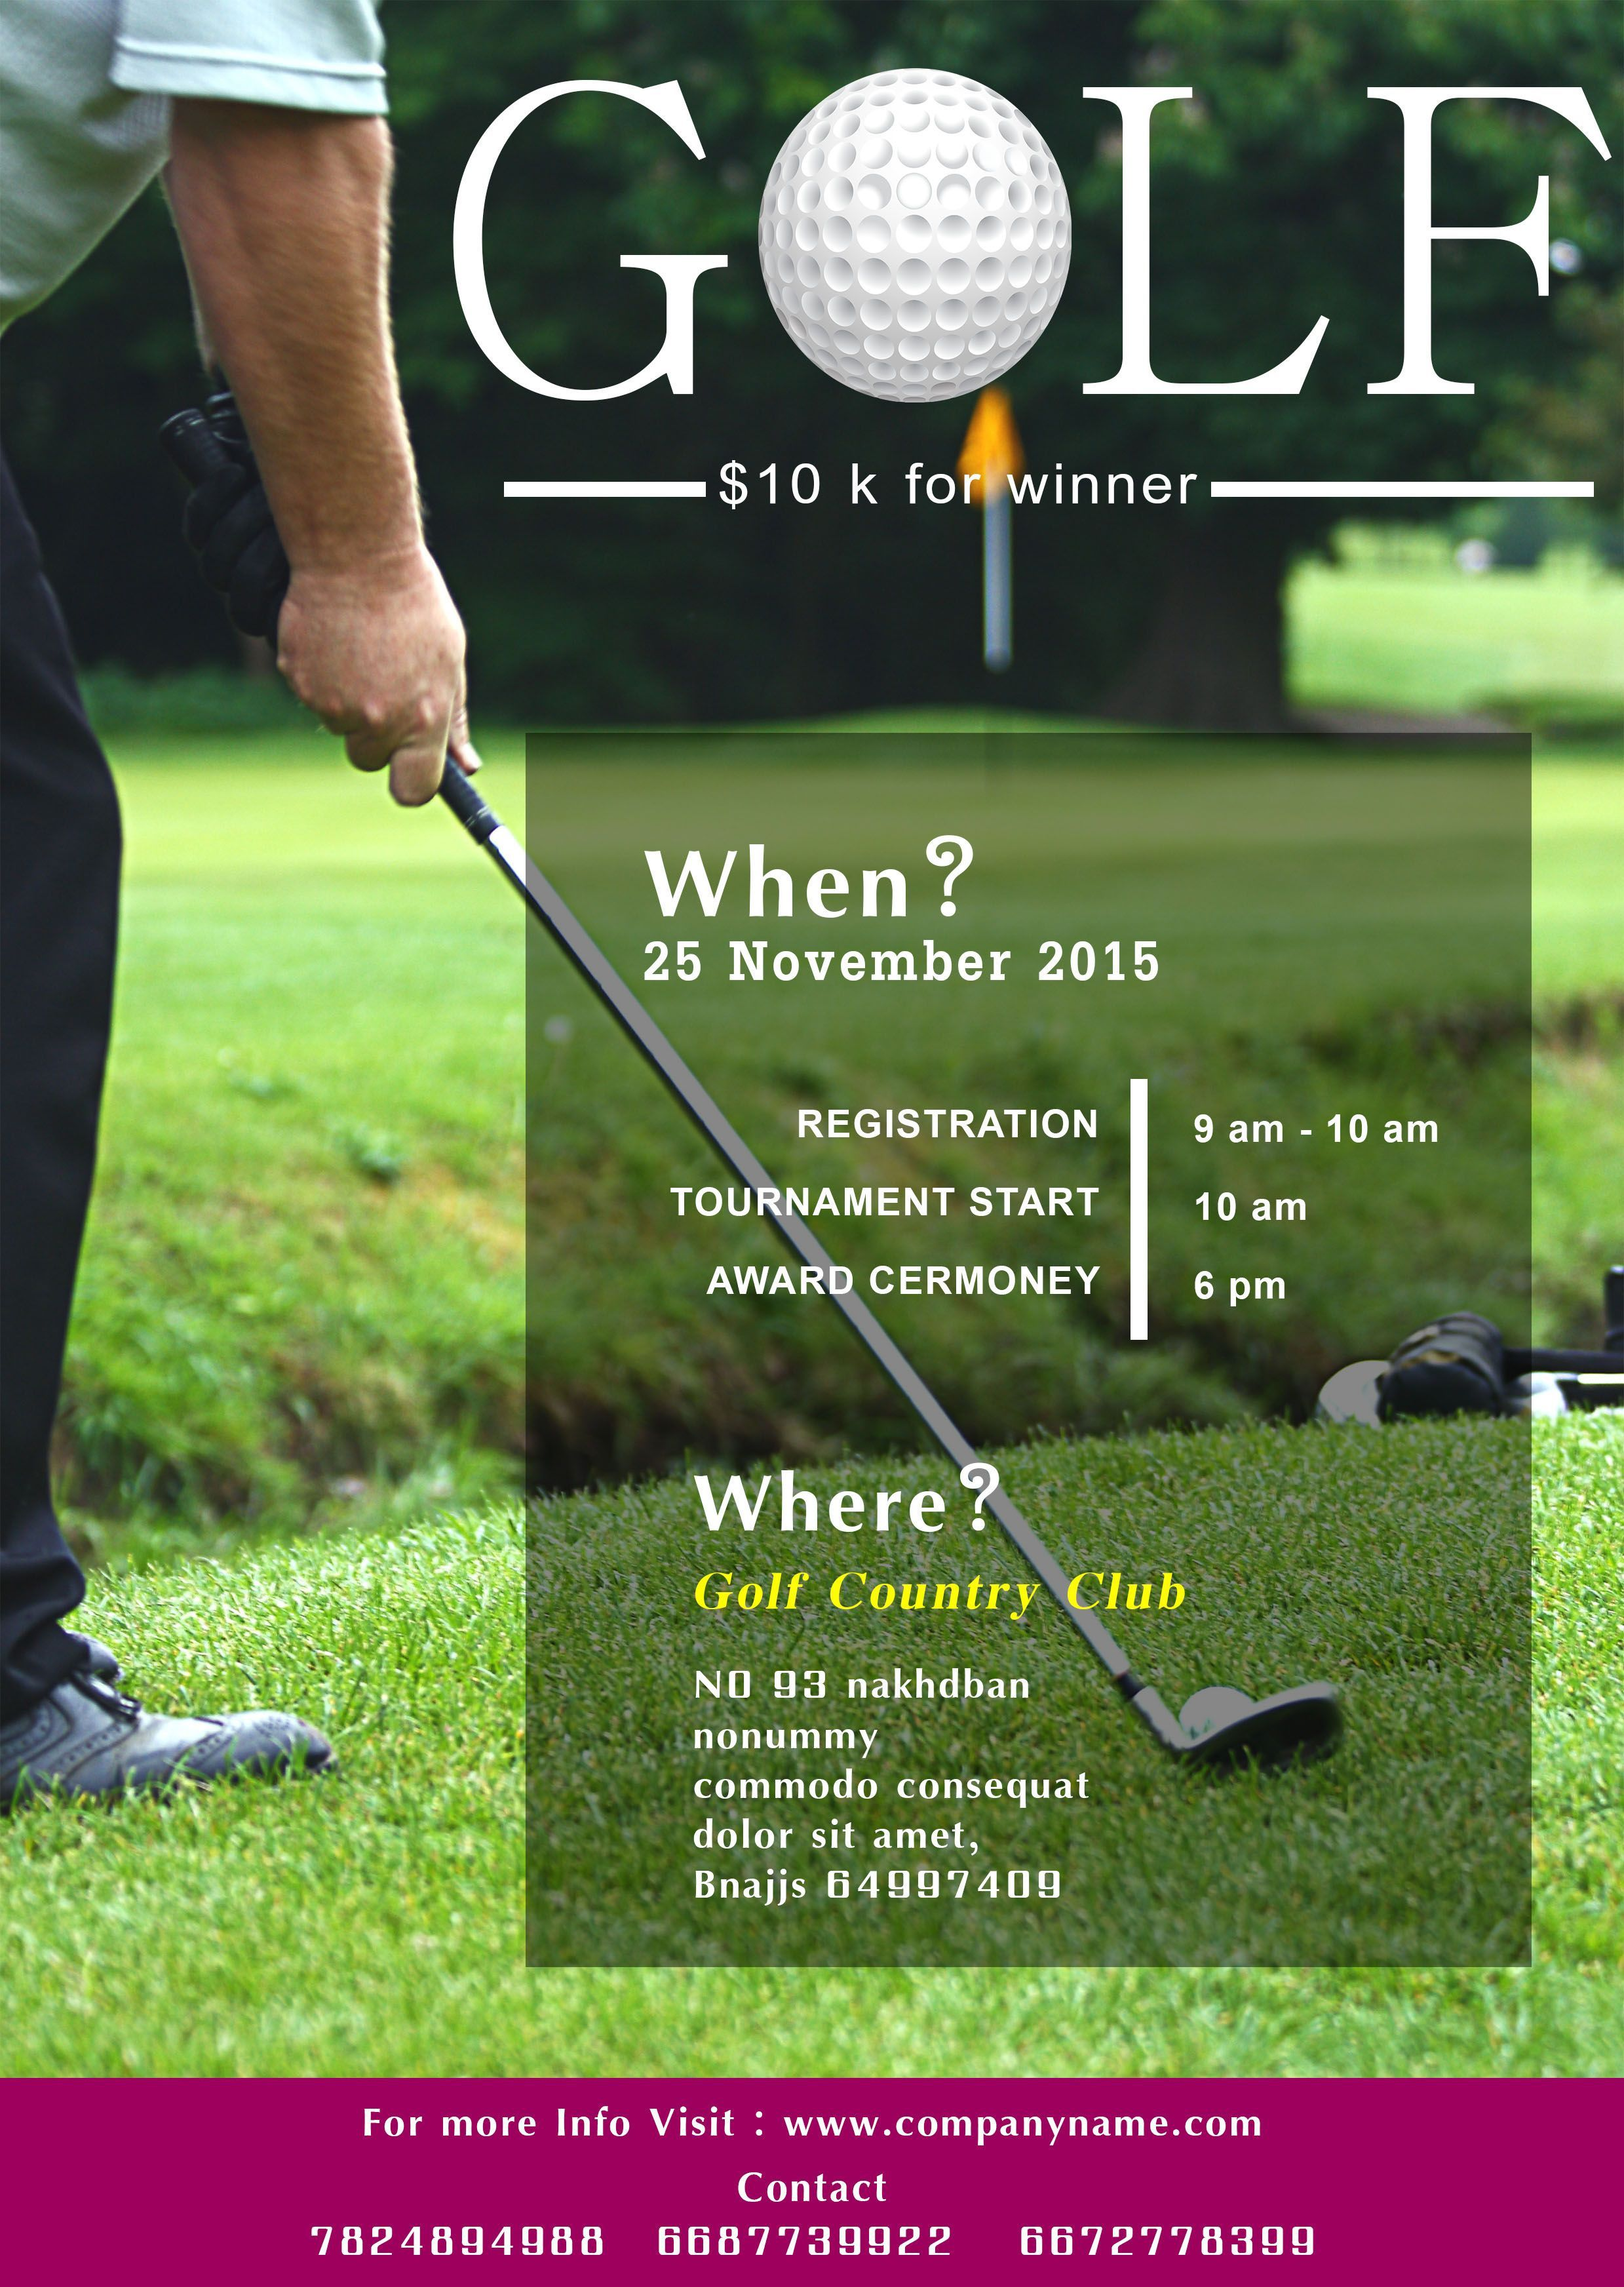 006 Stirring Golf Tournament Flyer Template Photo  Word Free PdfFull